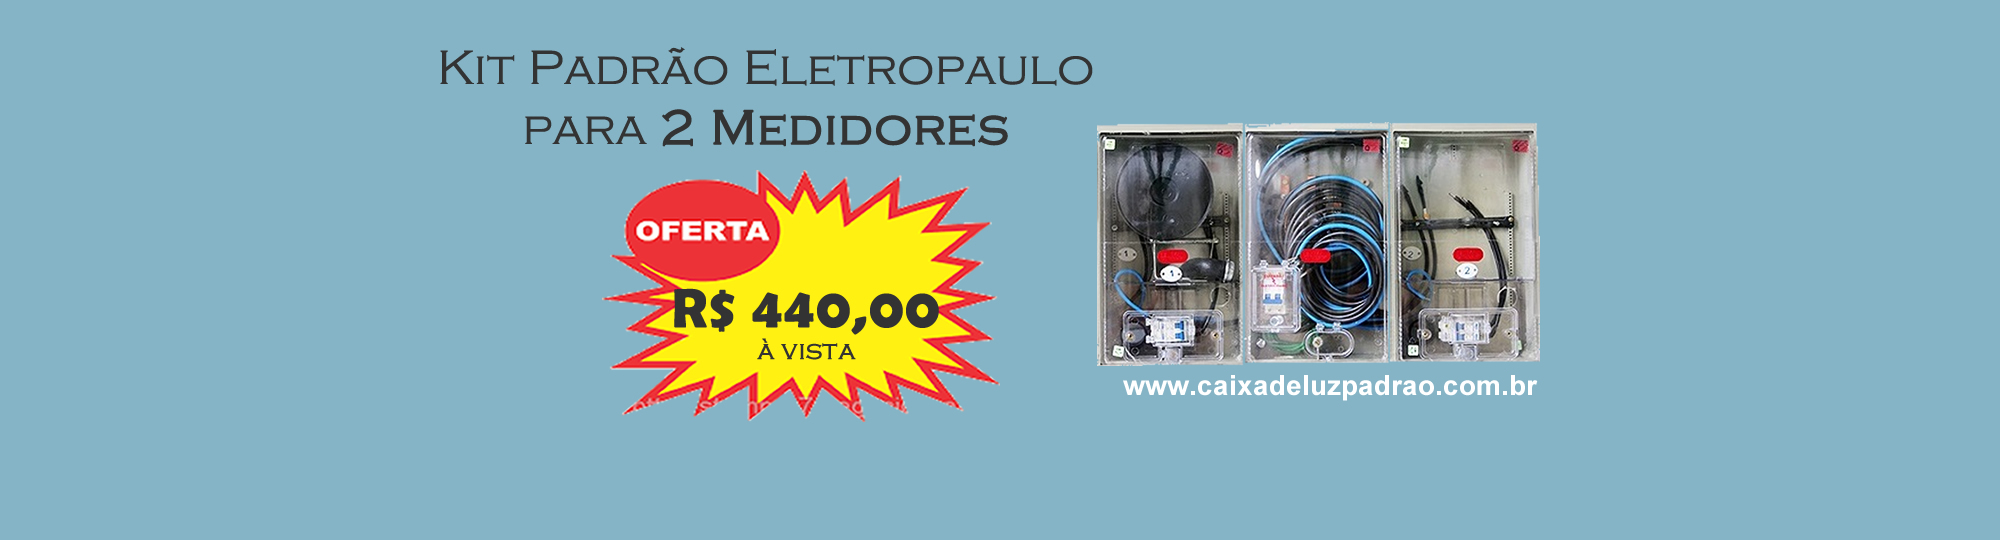 1981ffab570 Elétrica Padrão